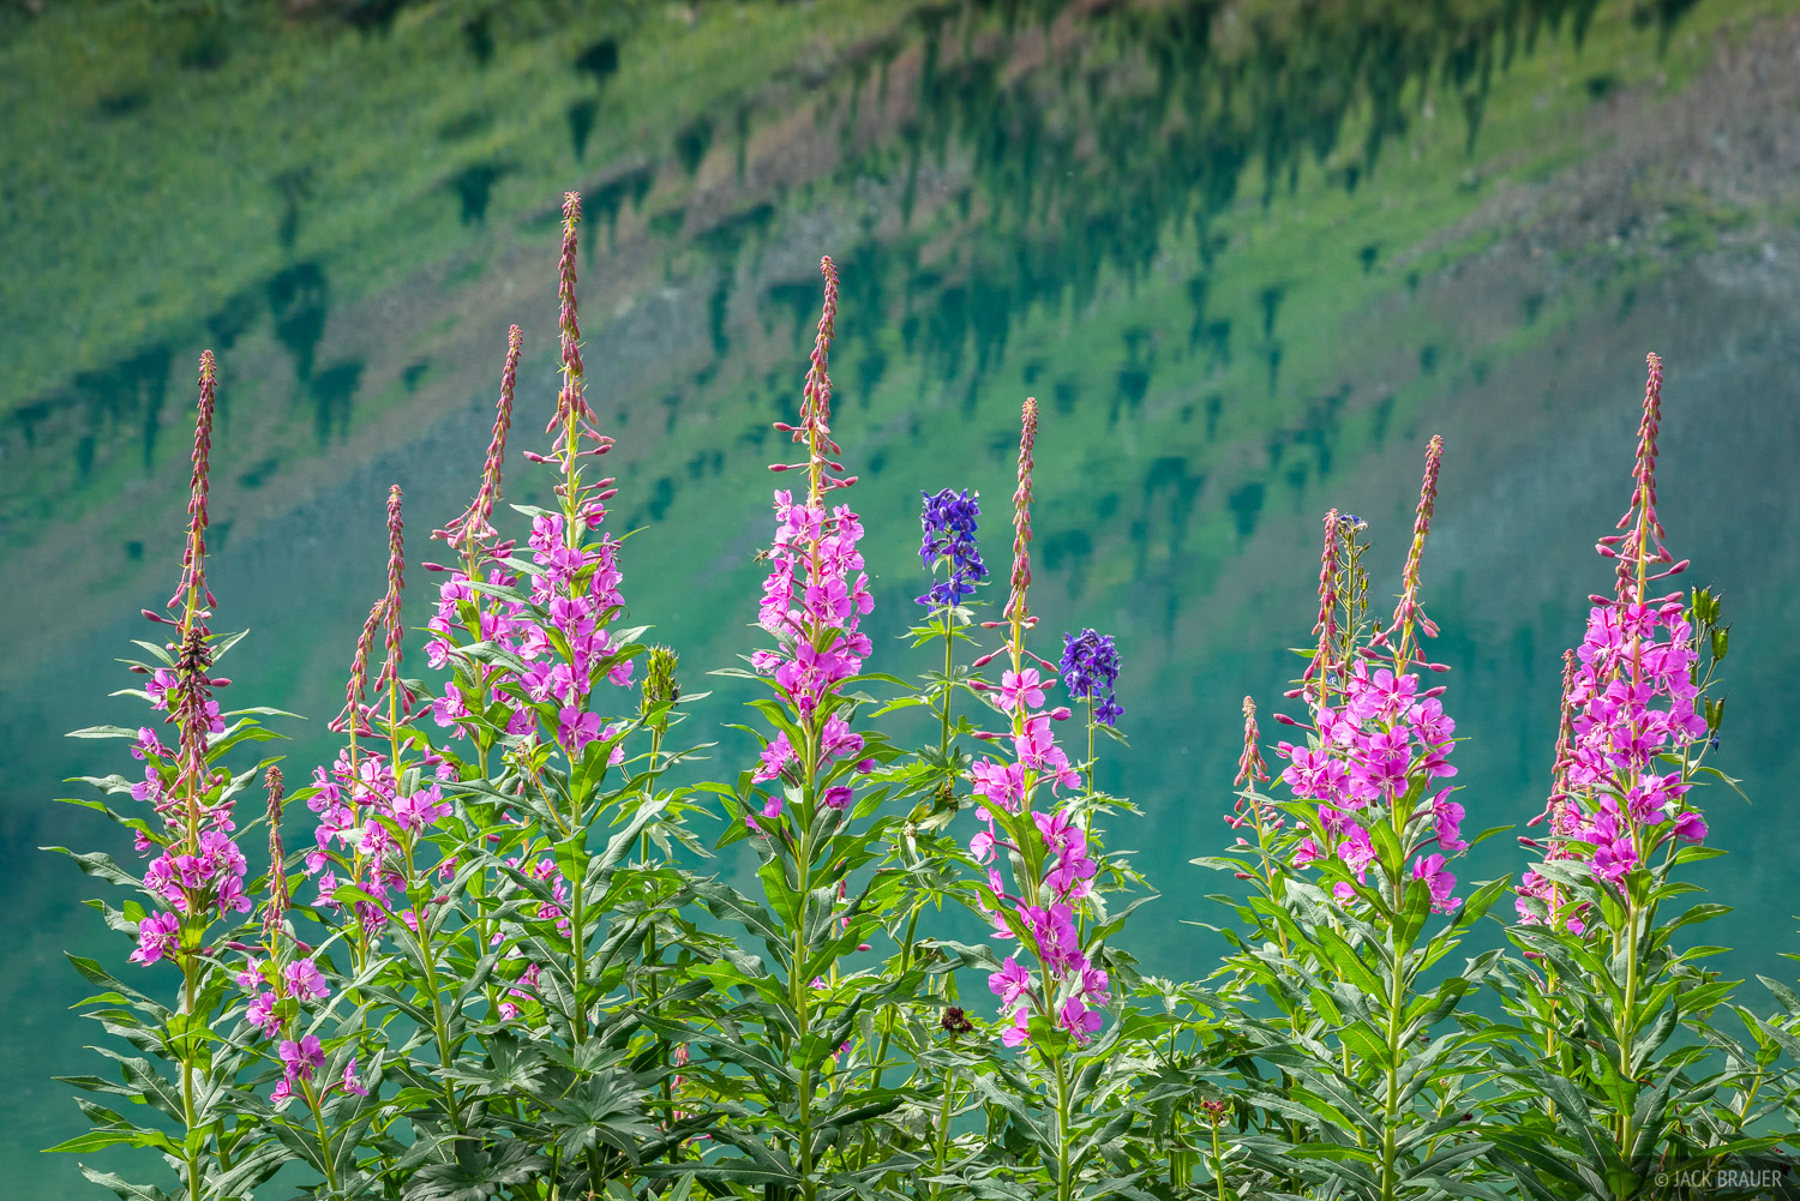 Fireweed wildflowers near an emerald lake.